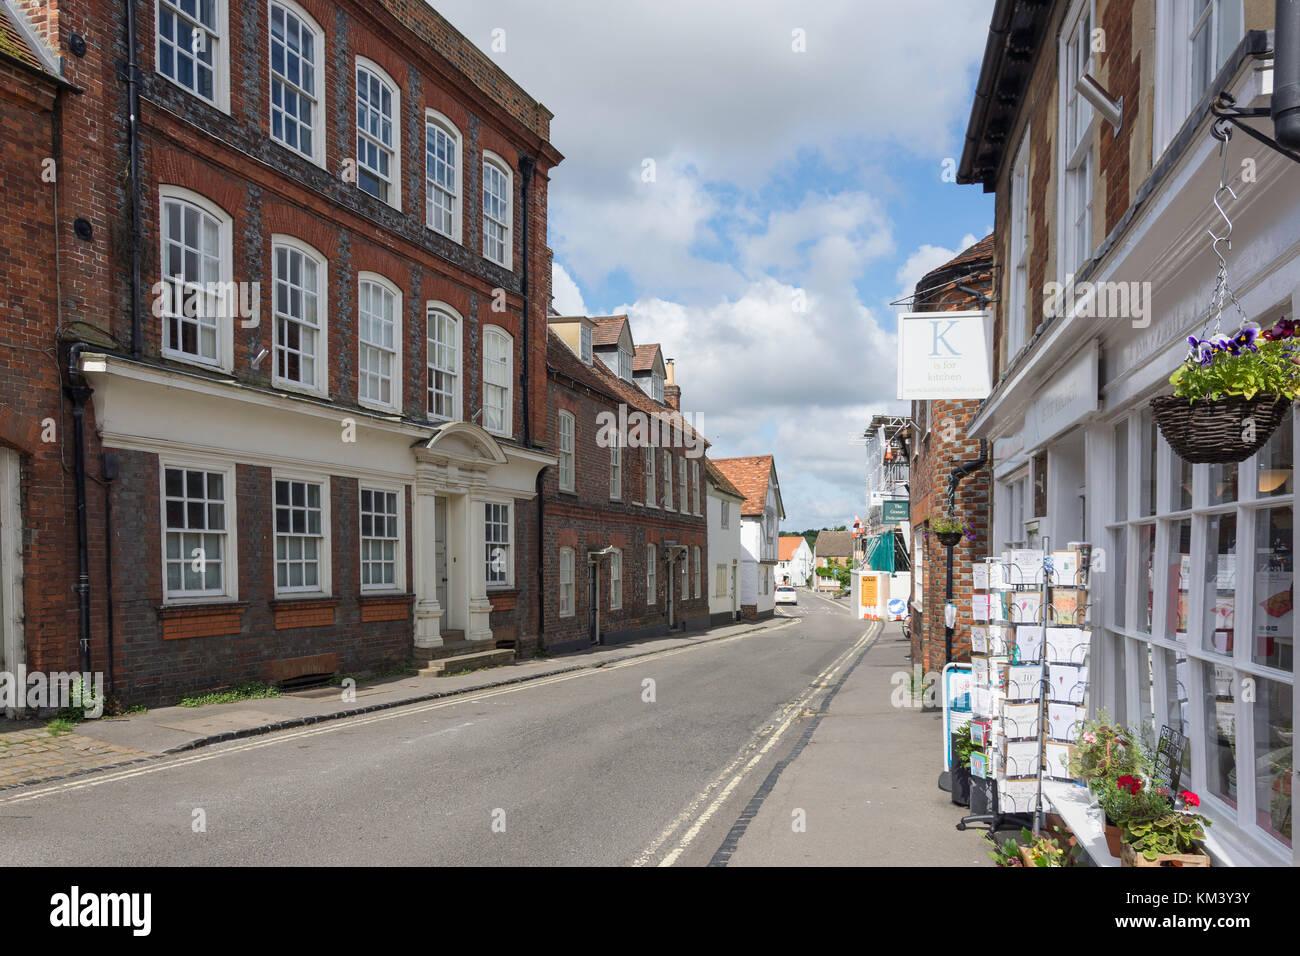 High Street, Watlington, Oxfordshire, England, United Kingdom - Stock Image